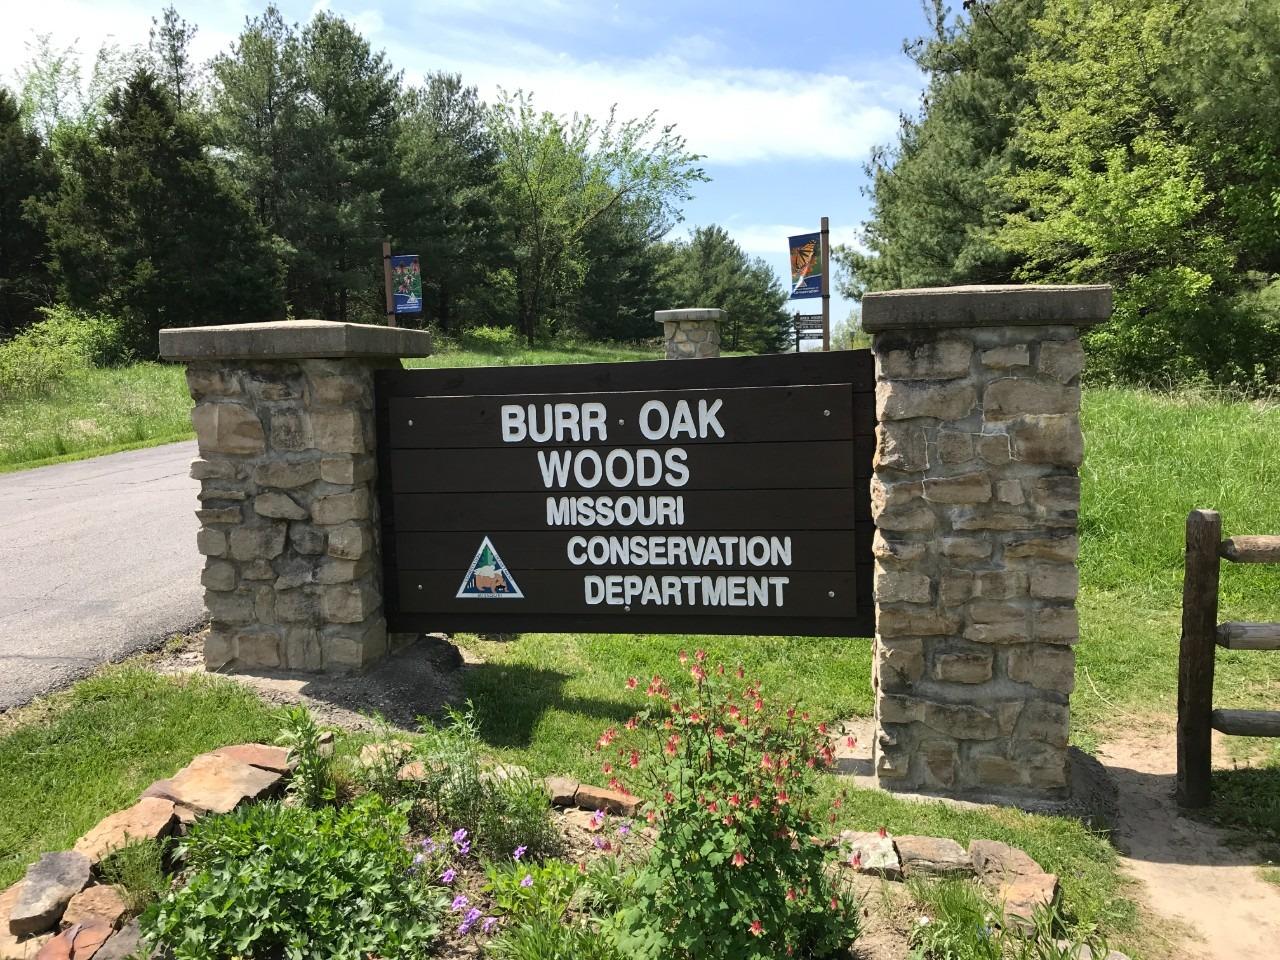 Burr Oak Woods Conservation Area